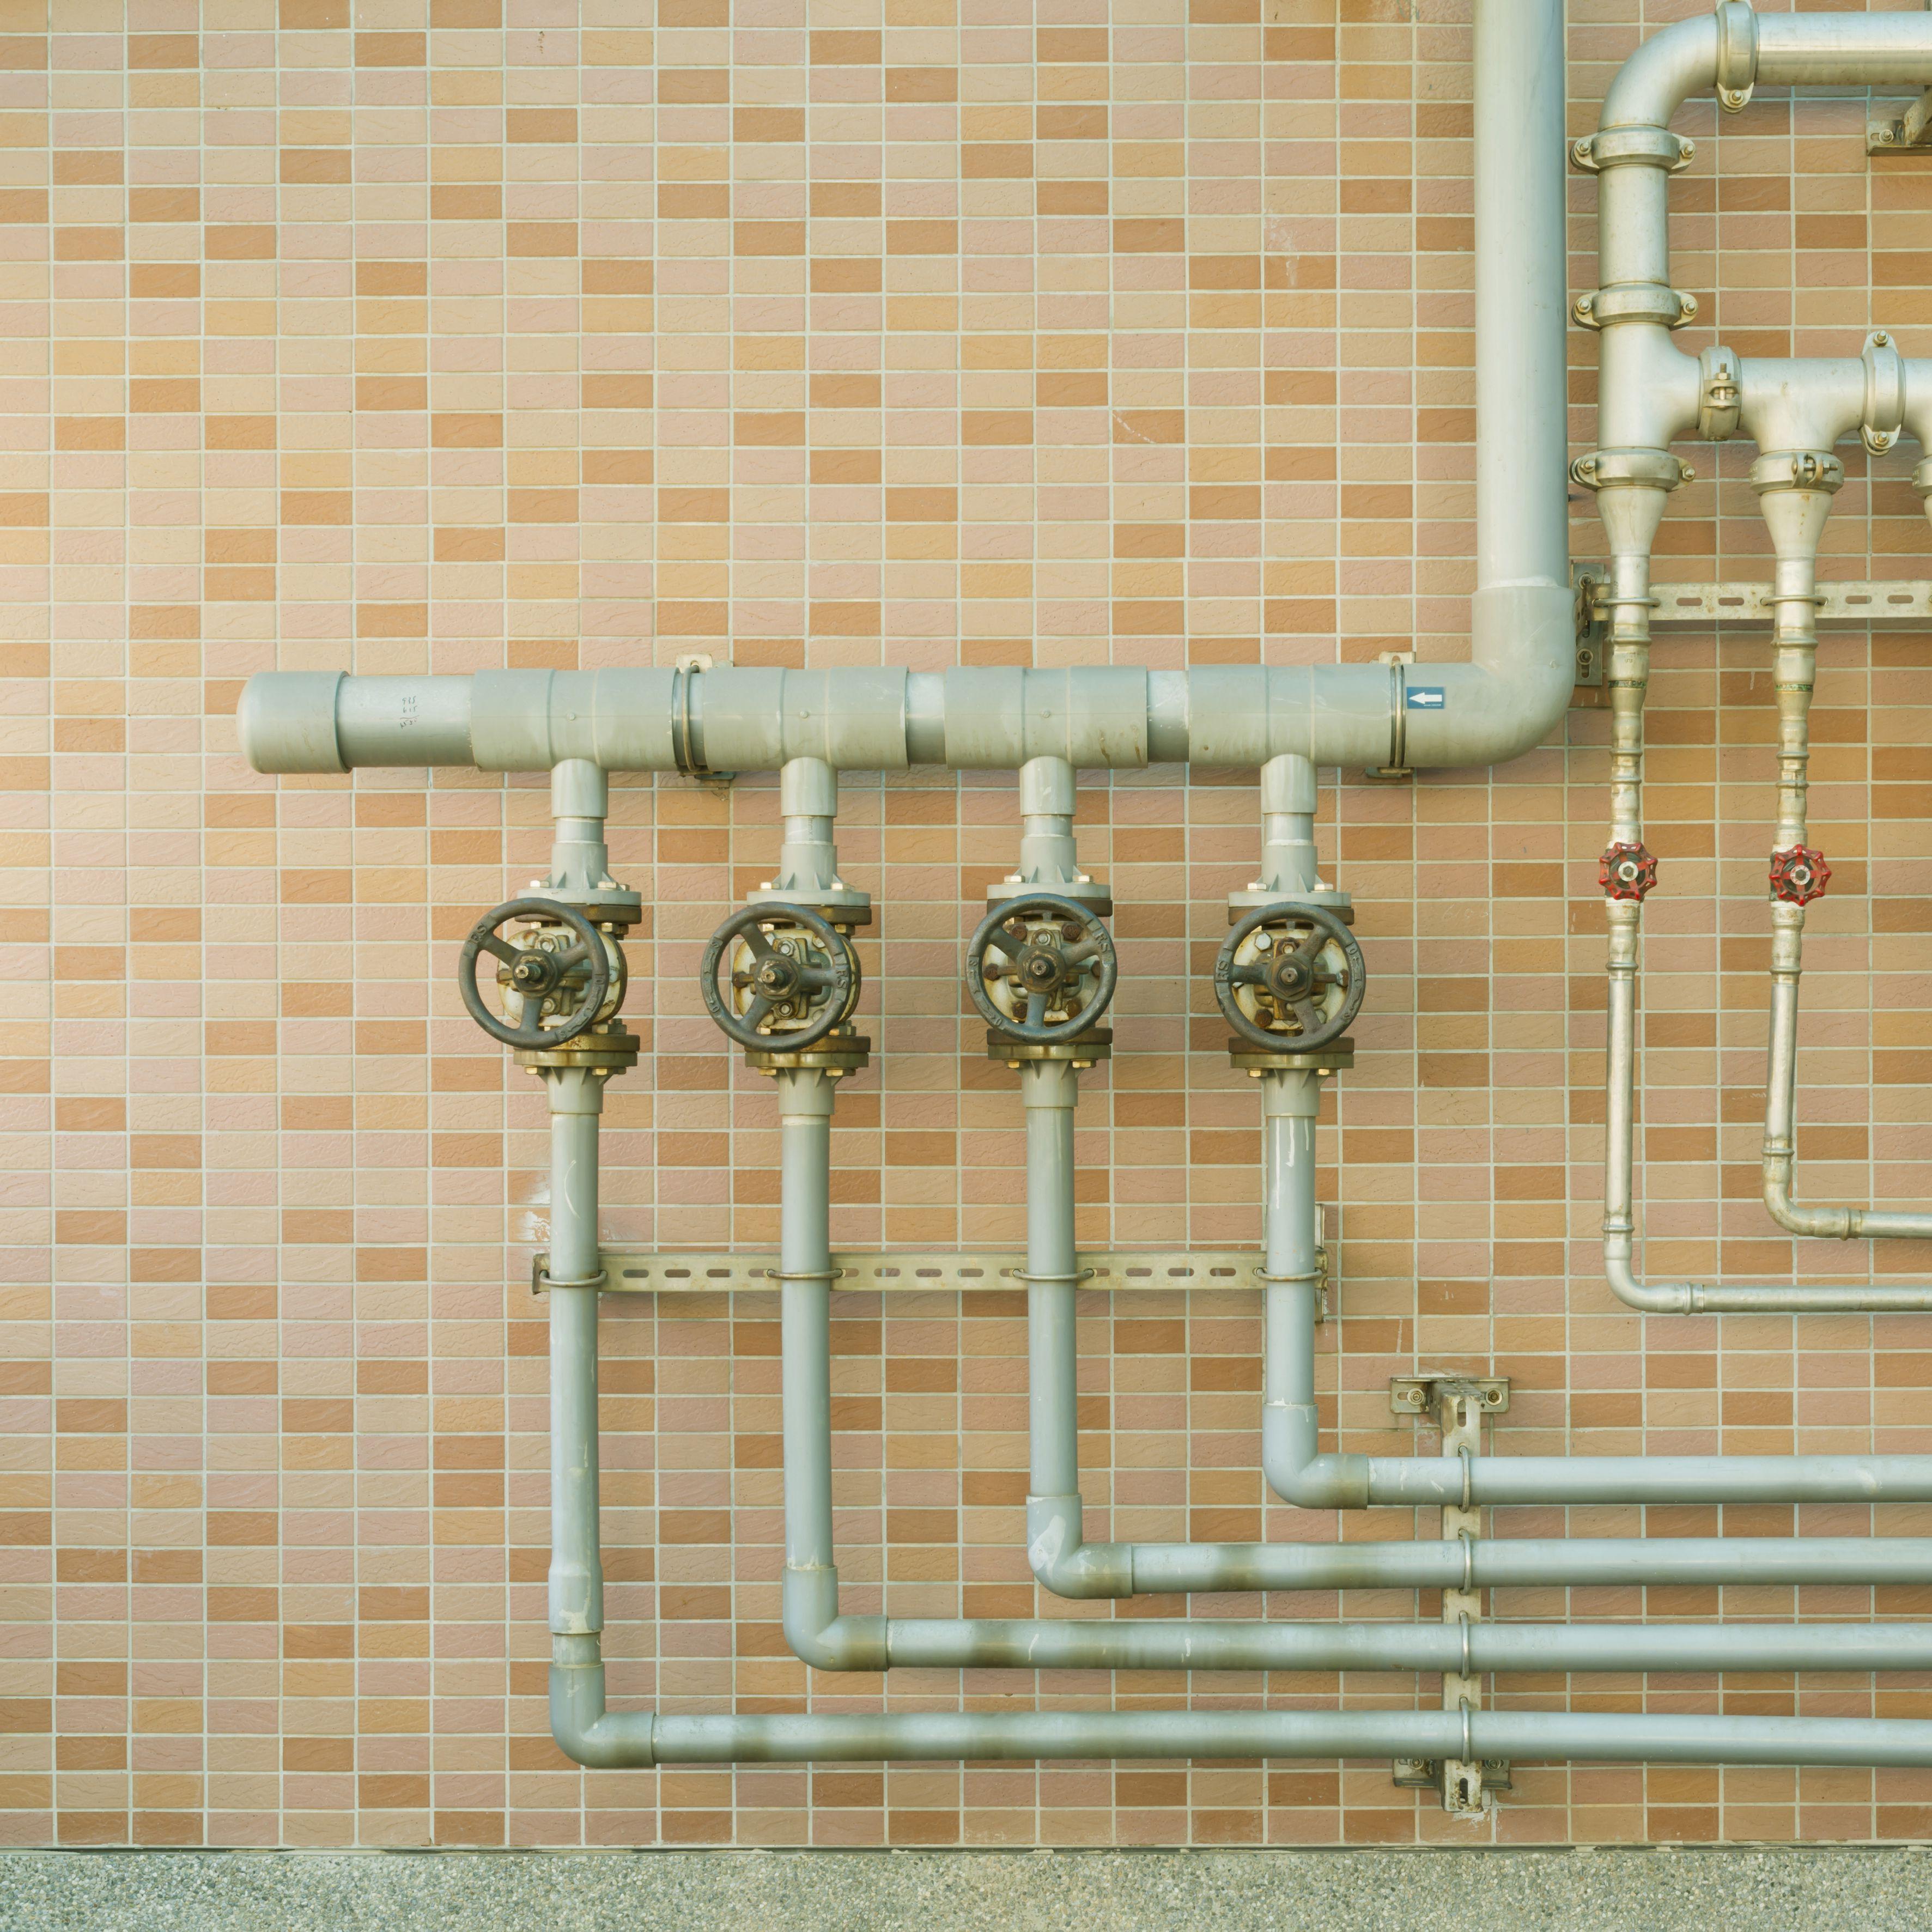 7 types of water shutoff valves